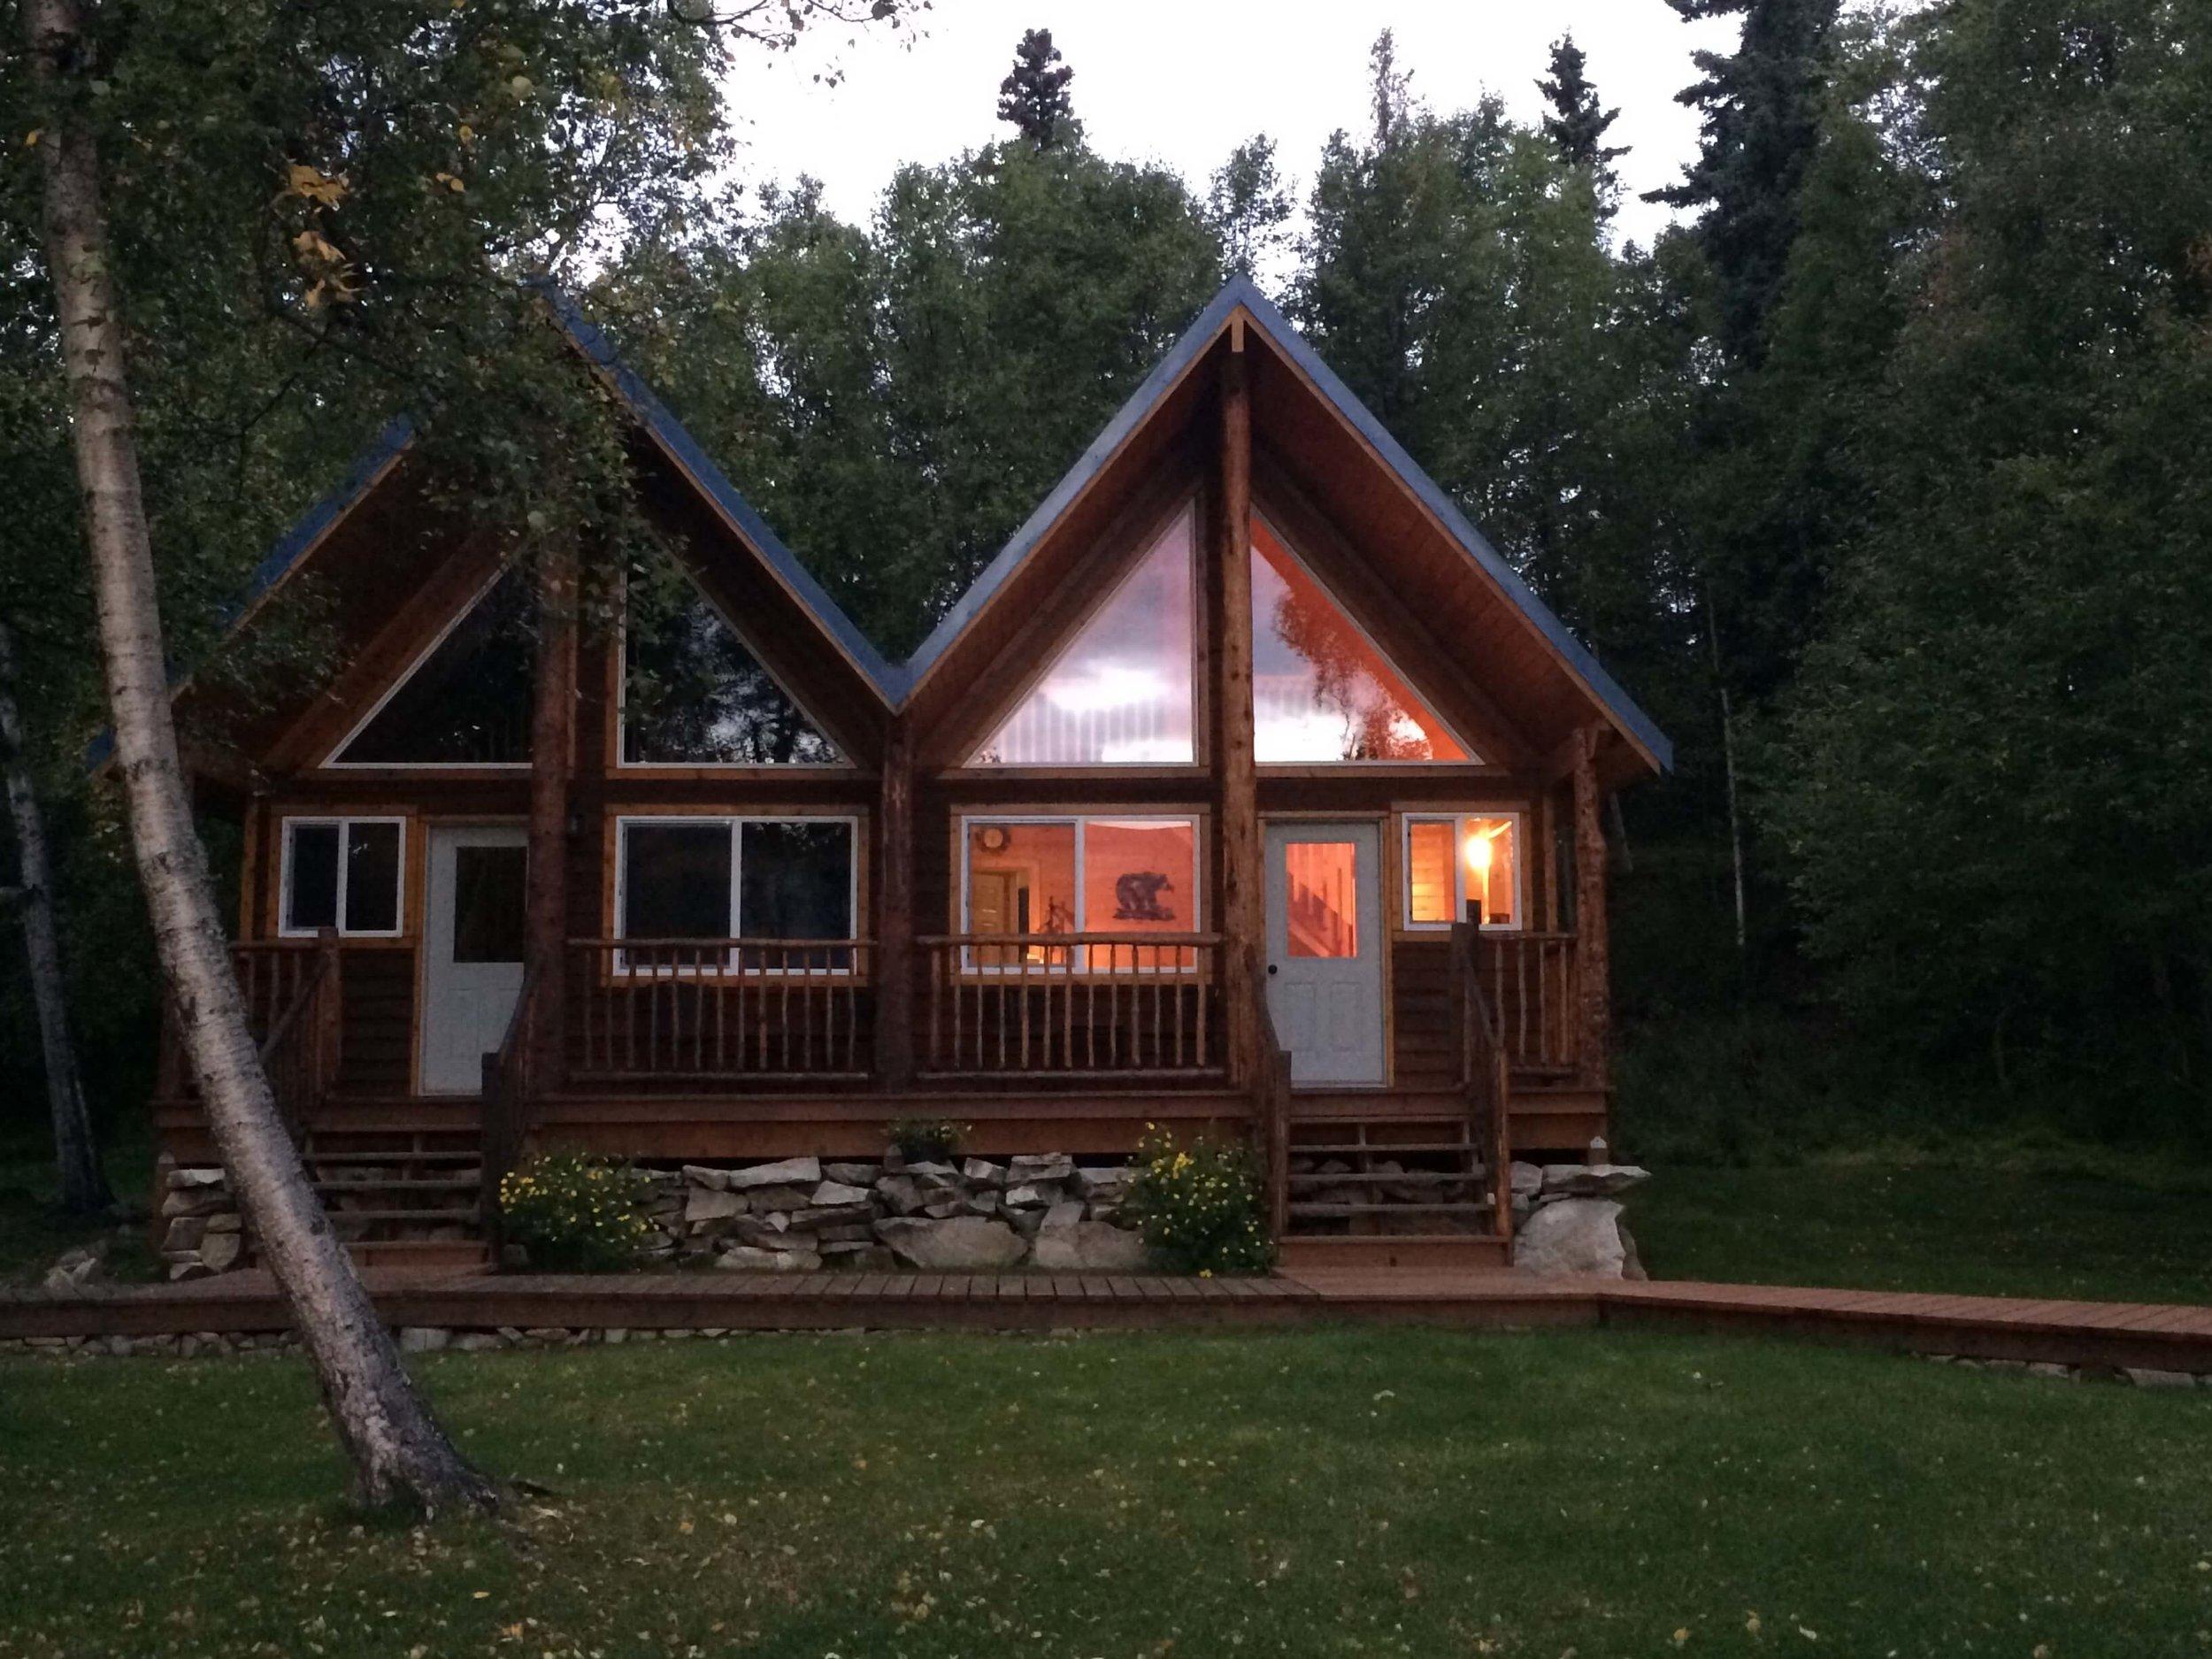 Our cabin at  The Farms Lodg e - Port Alsworth, AK